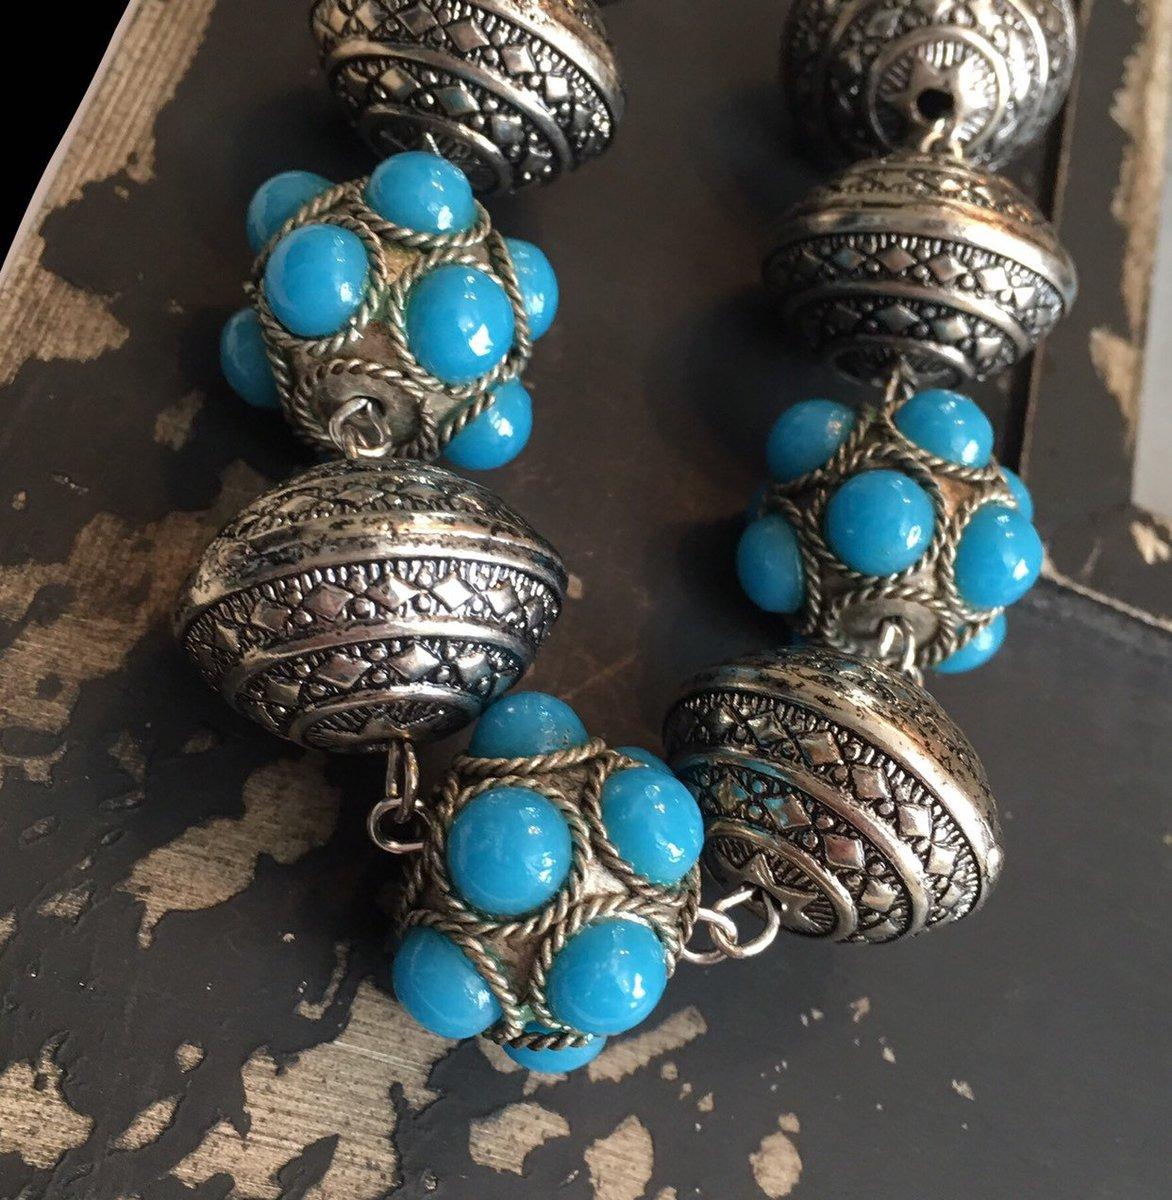 Chunky Boho necklace, handmade, large metal beads, tibetan, hippie, bold, blue turquoise color, Boho, silver, statement necklace  #Bridaljewelry #Handmadejewelry #Chunkyboho #Bohochic #Stonenecklace #CasualStatement